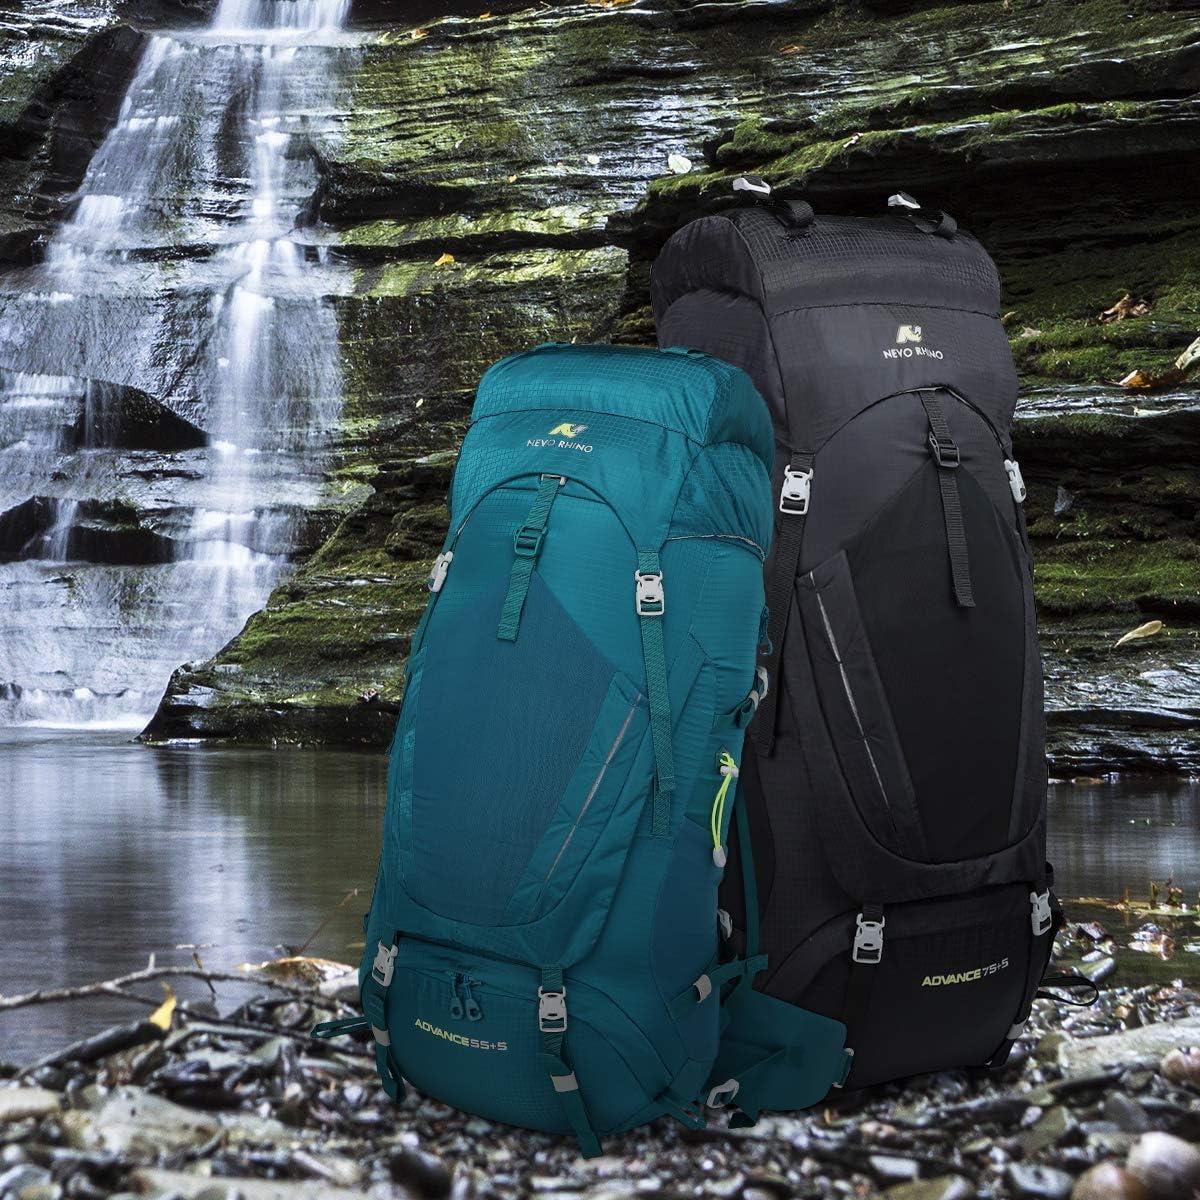 NEVO RHINO 50L//60L//80L Internal Frame Backpack,Ultralight waterproof Daypack for Hiking Camping